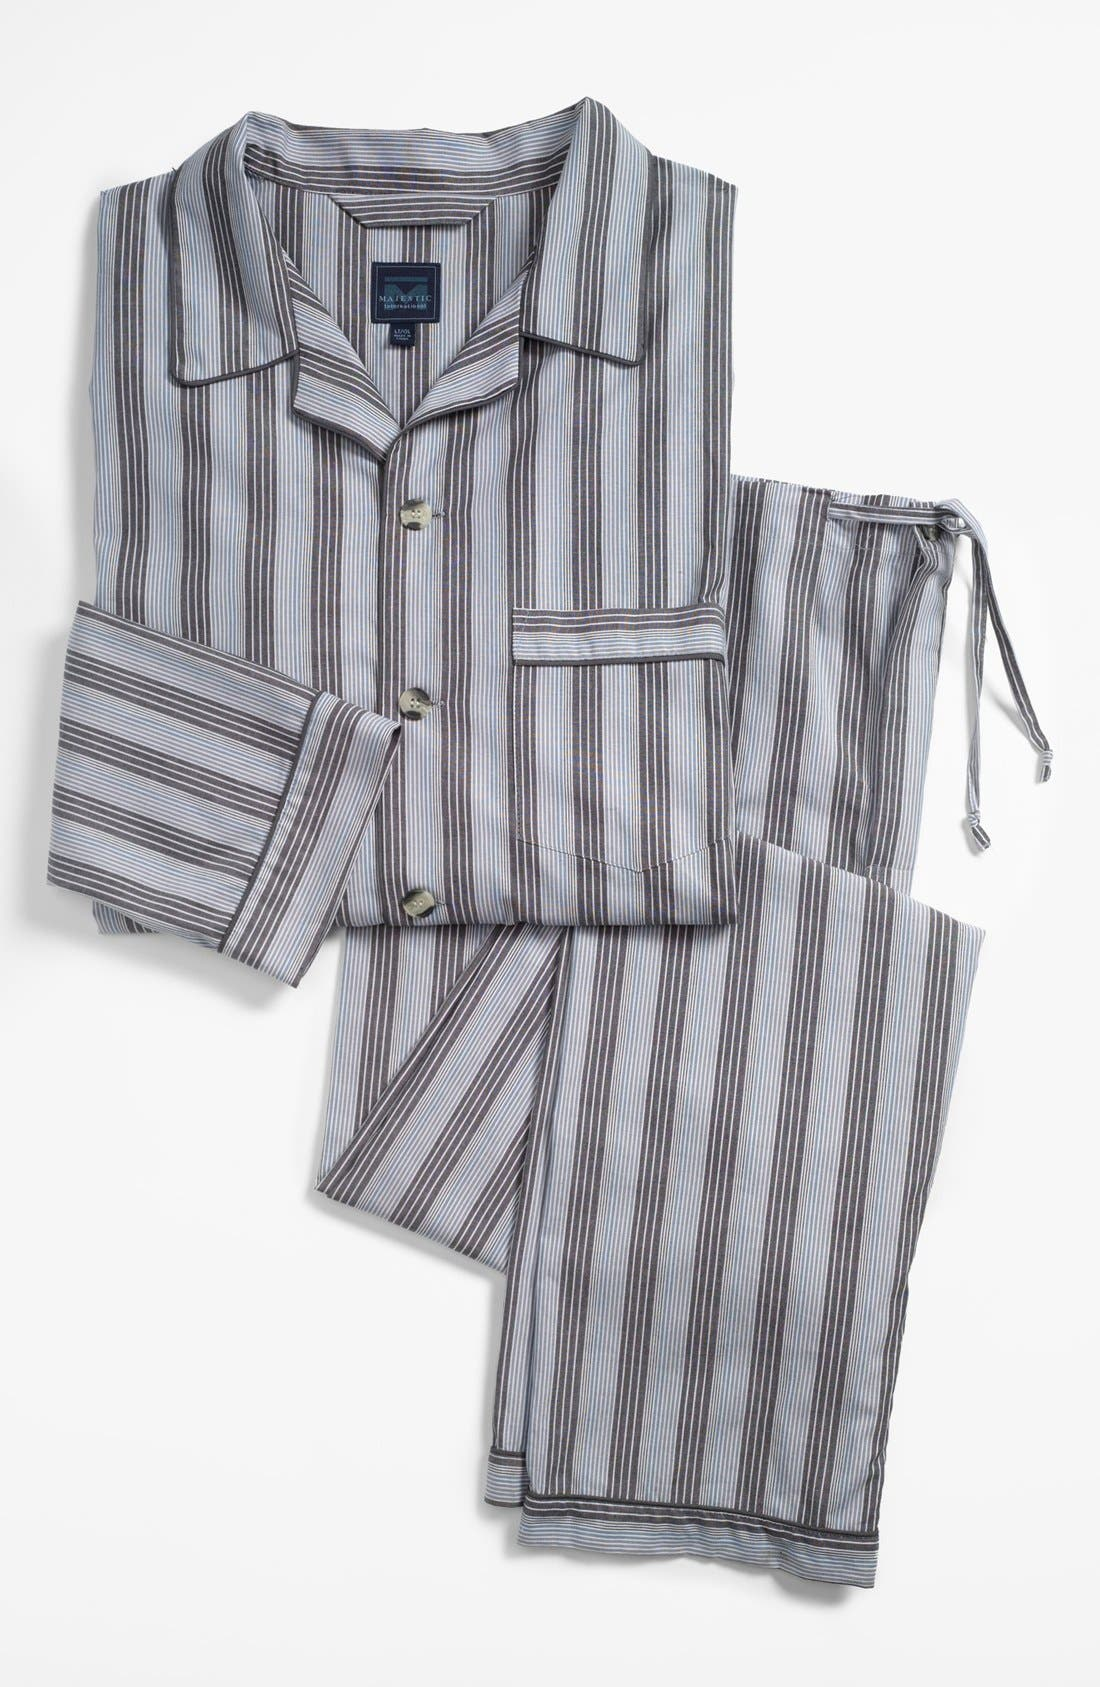 Main Image - Majestic International 'Westin' Pajamas (Big & Tall)